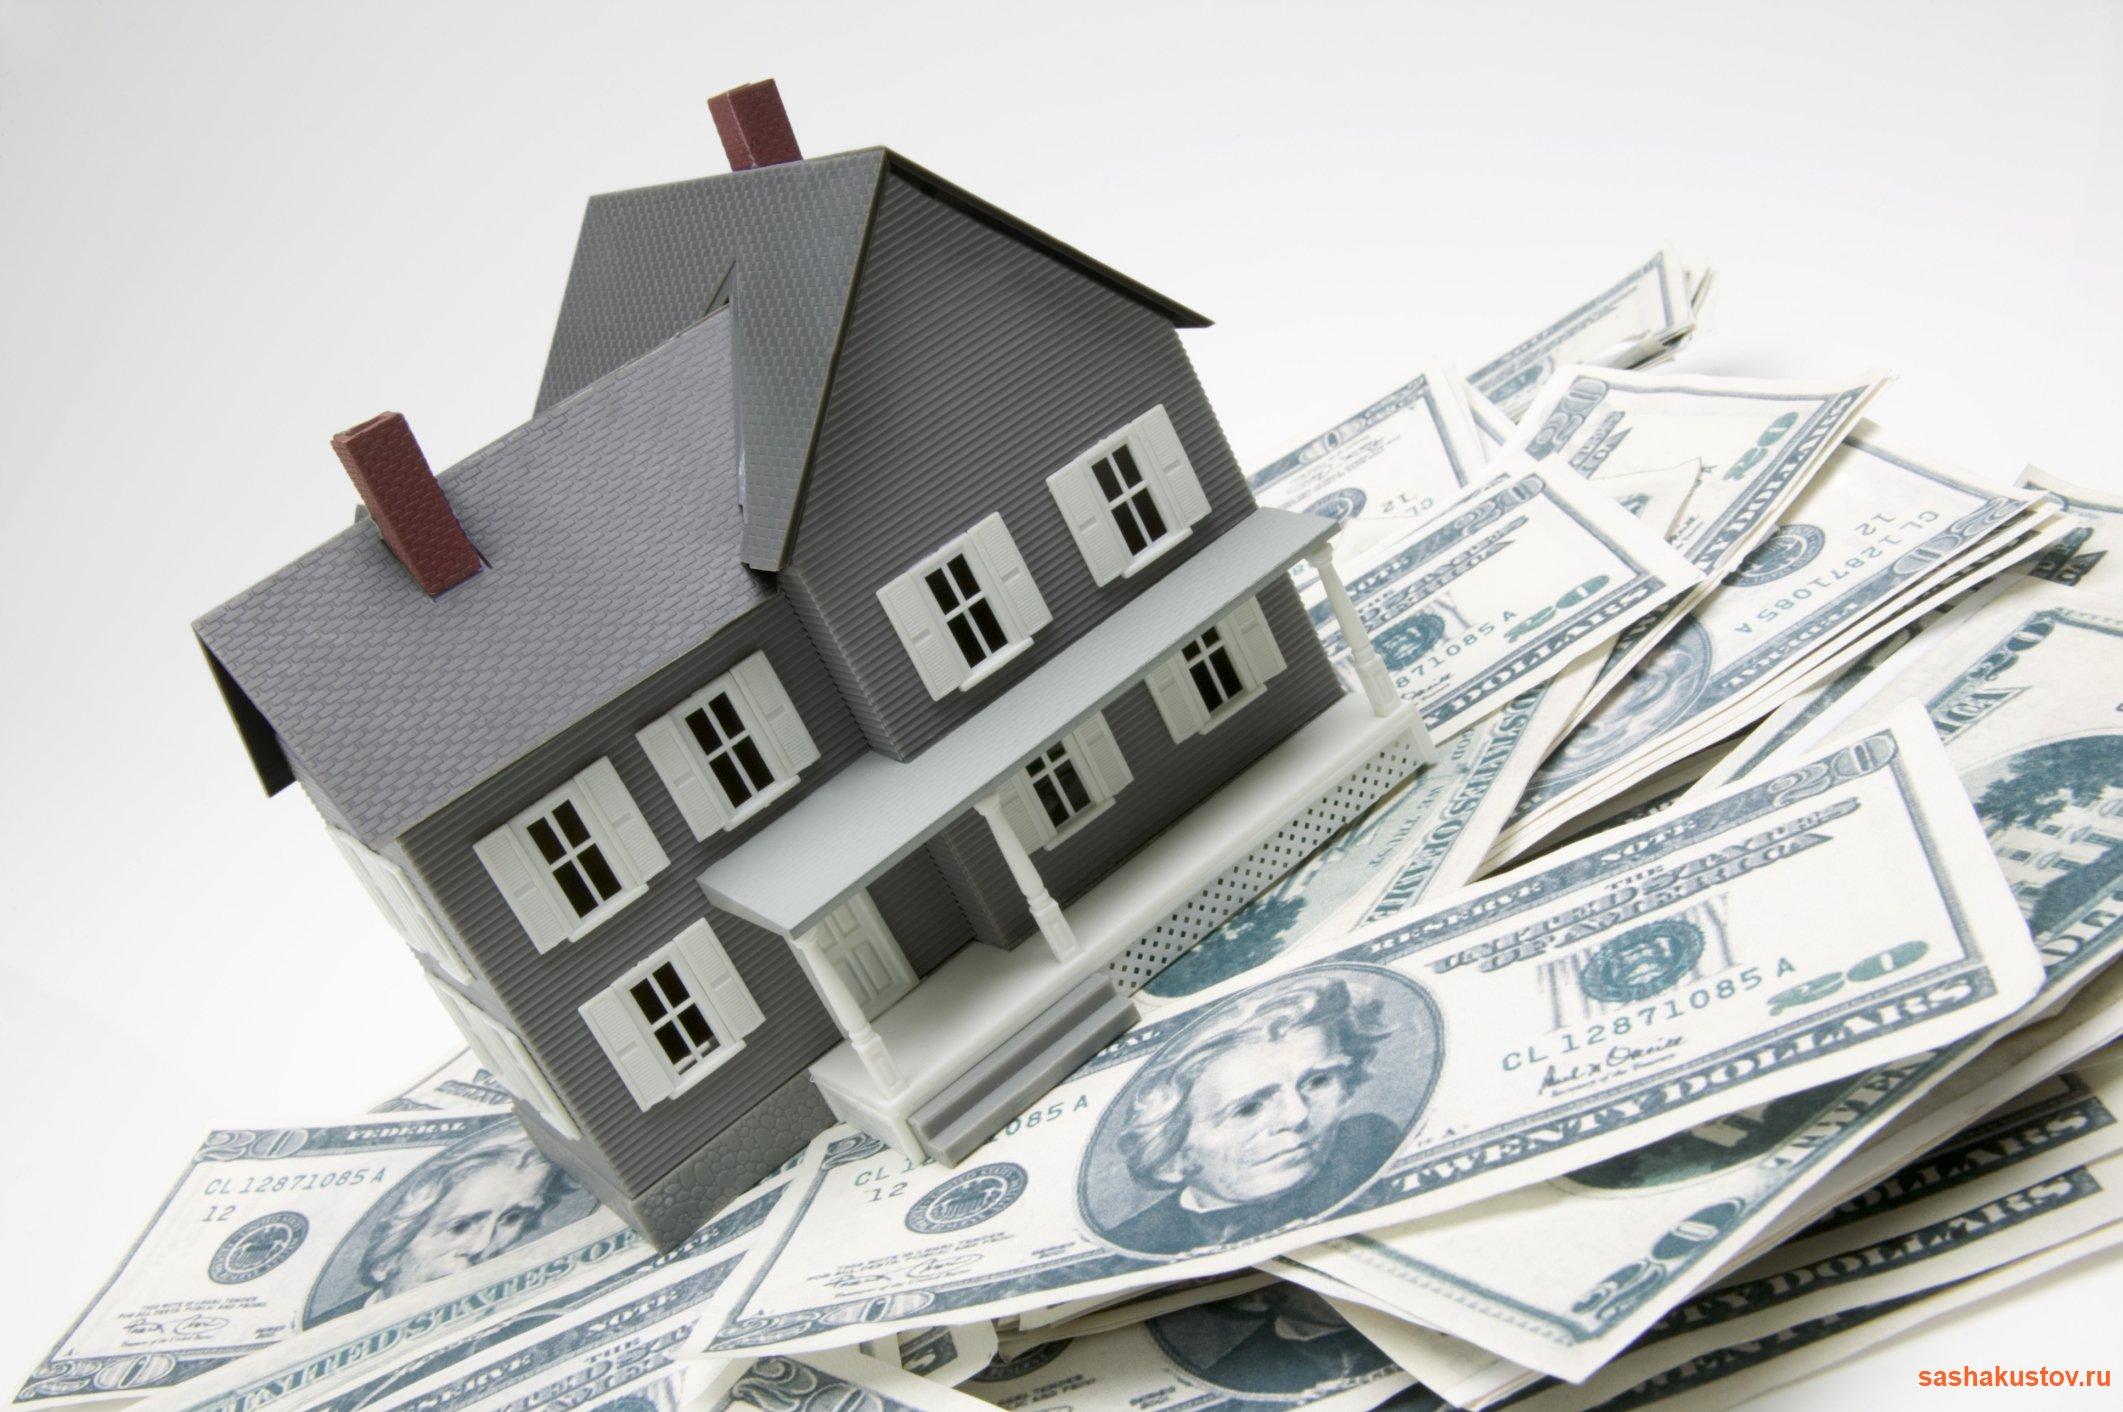 Кредитпод залог недвижимости